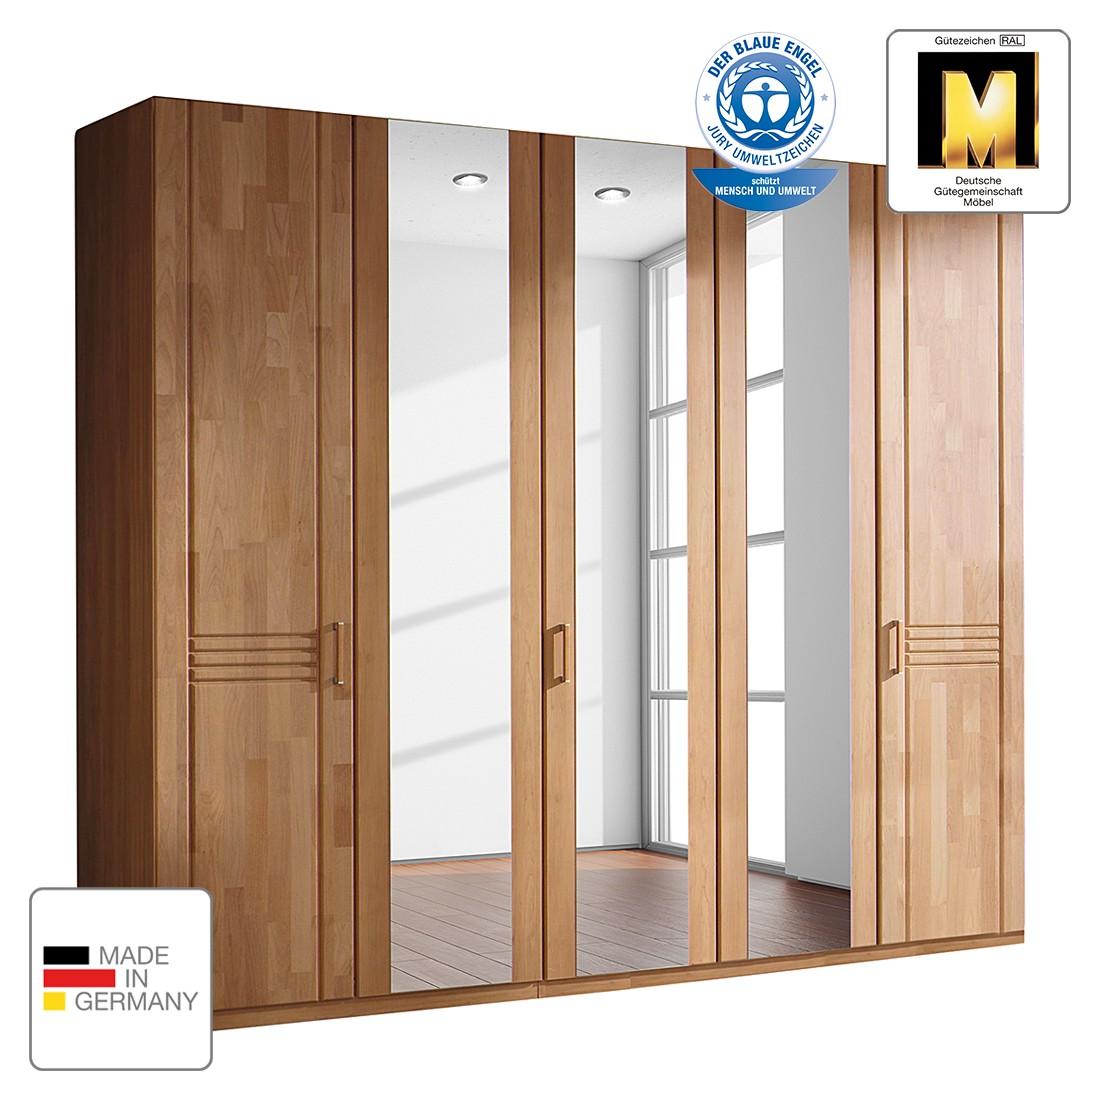 goedkoop Draaideurkast Savina Els 235cm 5 deurs 1 spiegeldeur Zonder Passe partout lijst Rauch Steffen